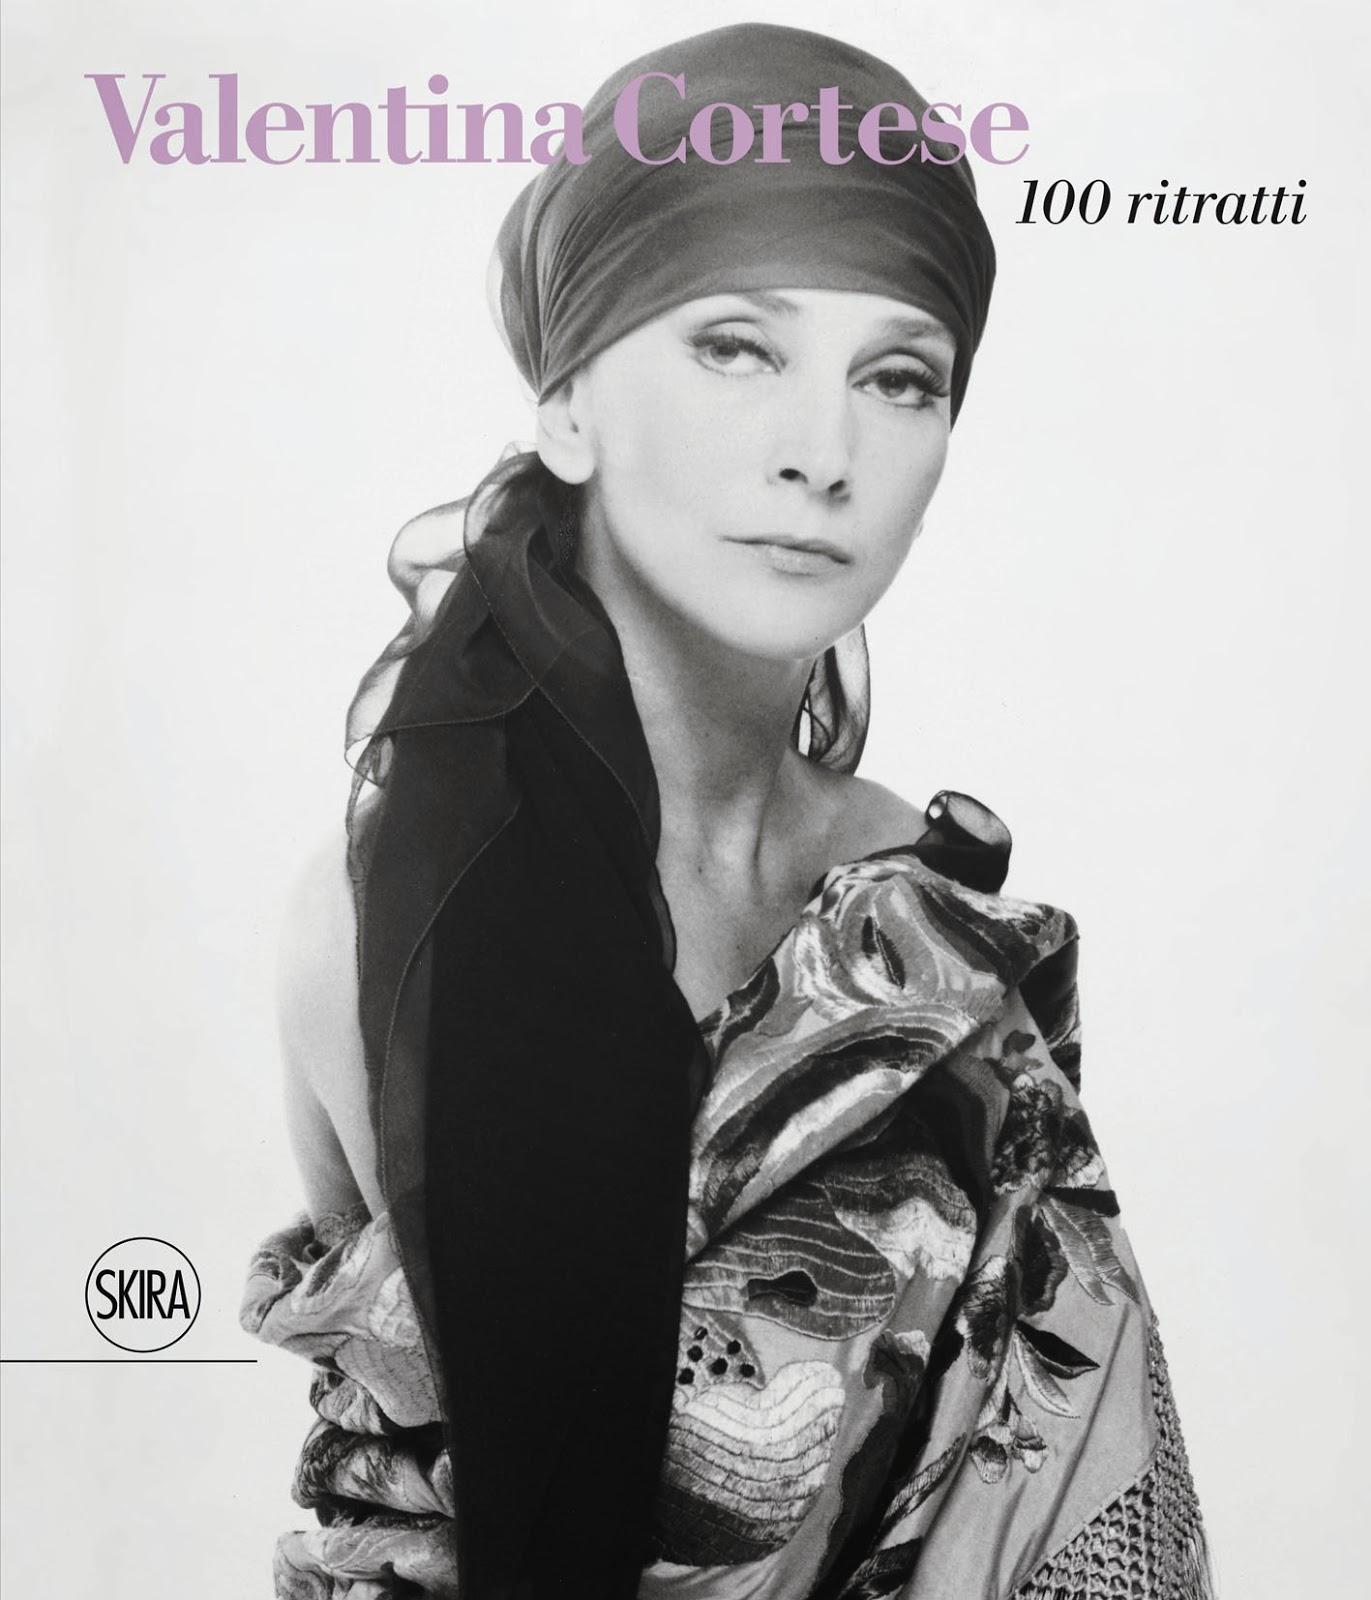 Valentina Cortese 100 ritratti 2013 Skira